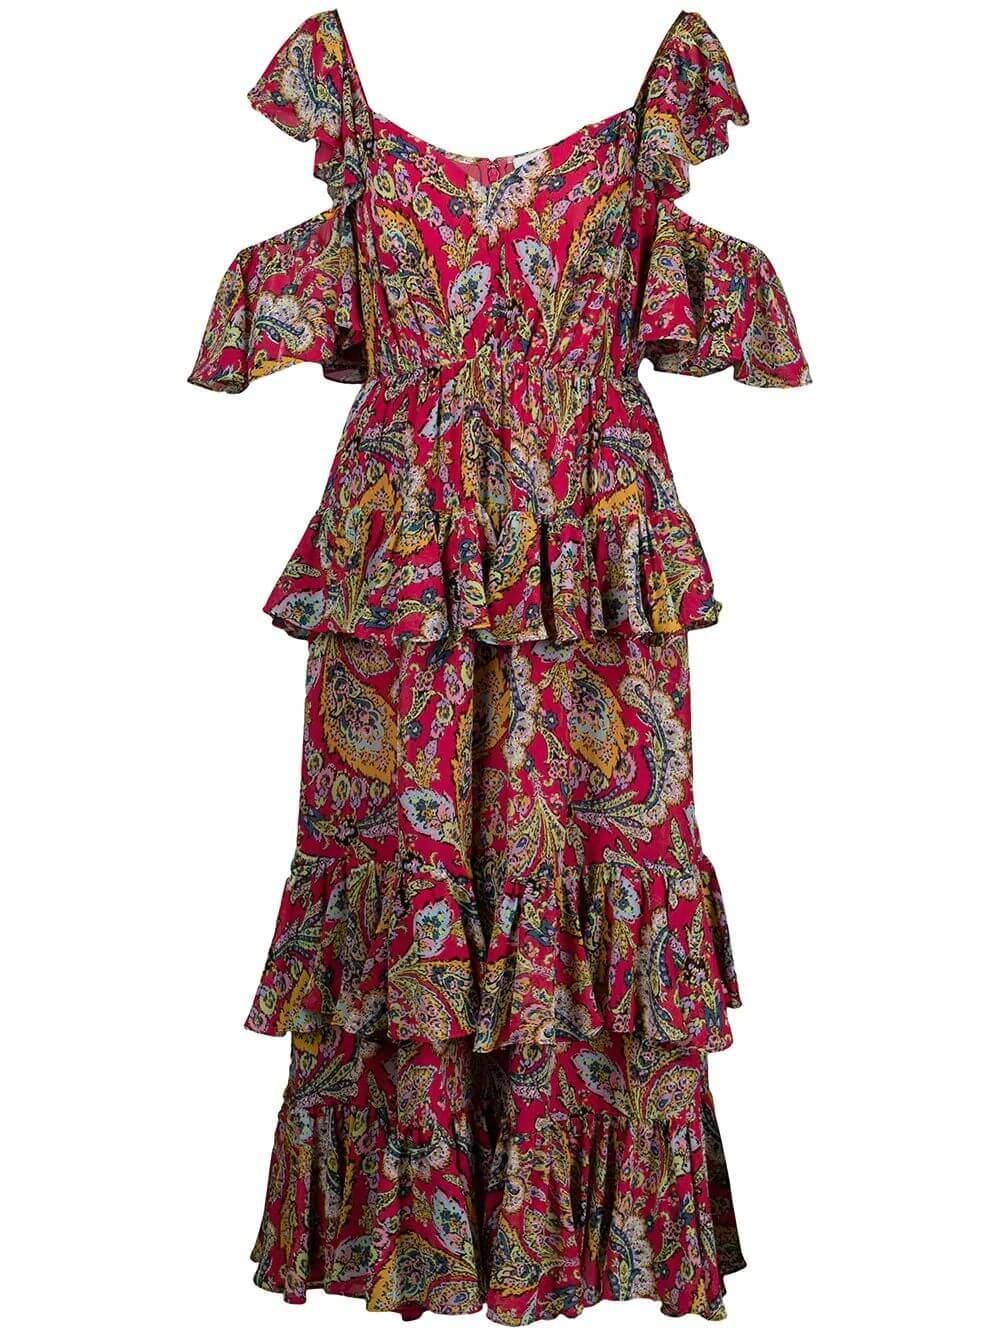 Collier Ruffle Midi Dress